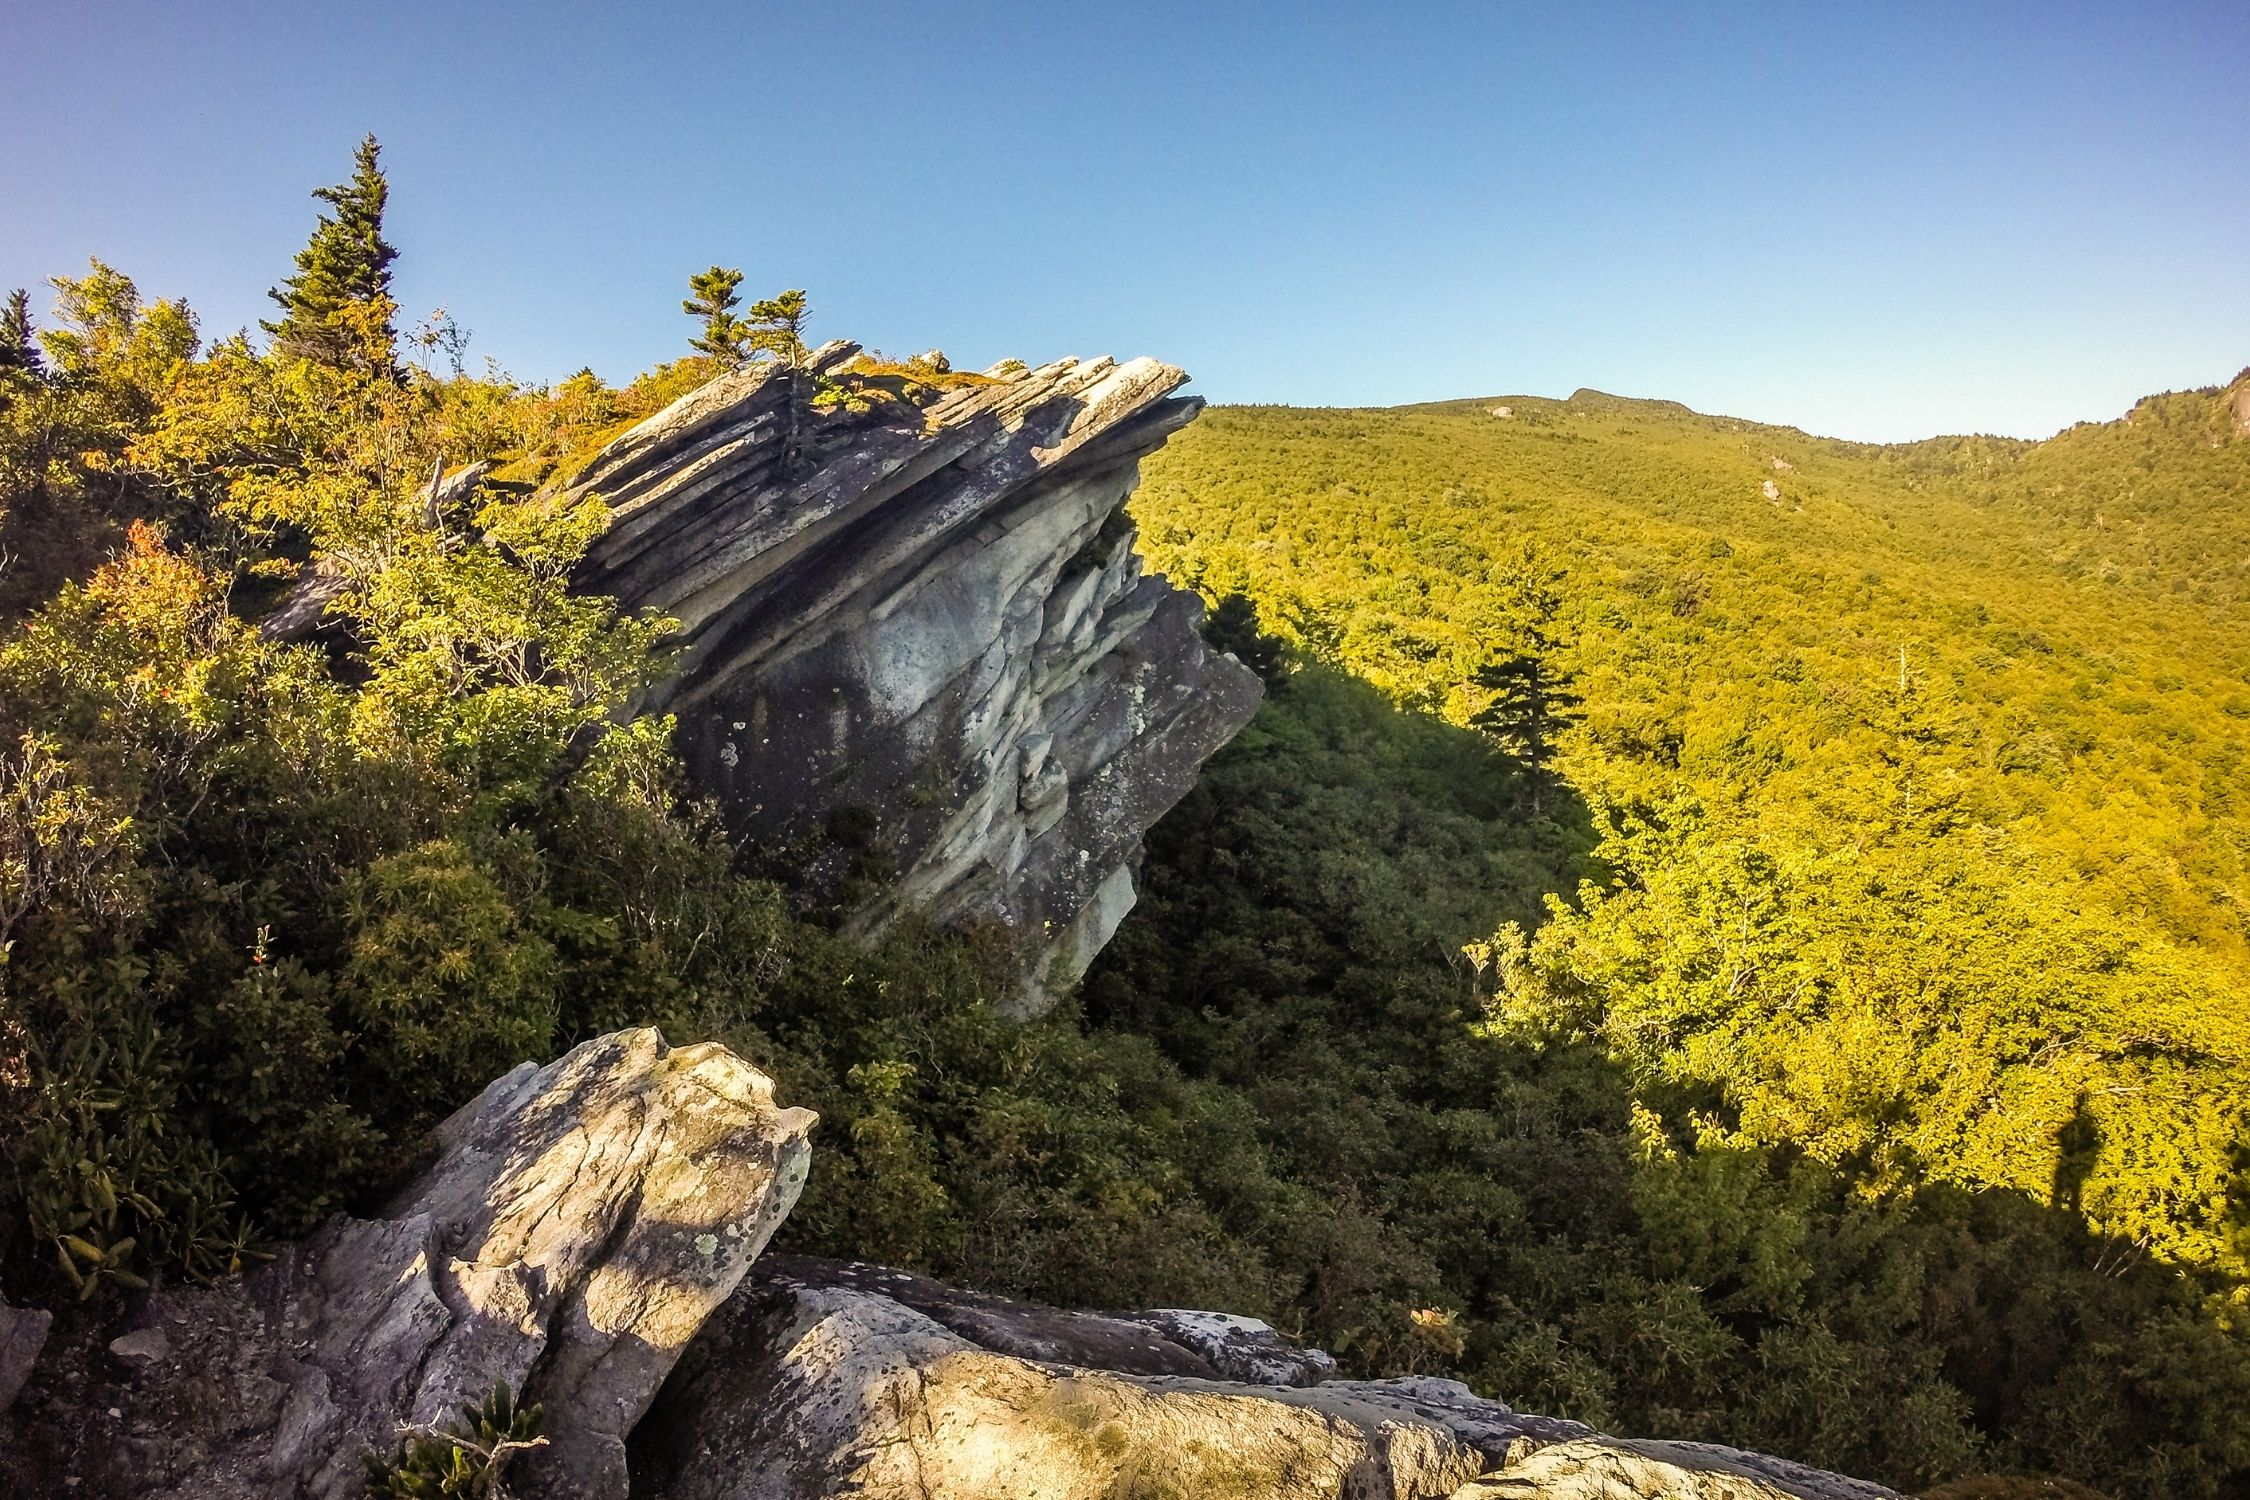 Calloway Peak Trail